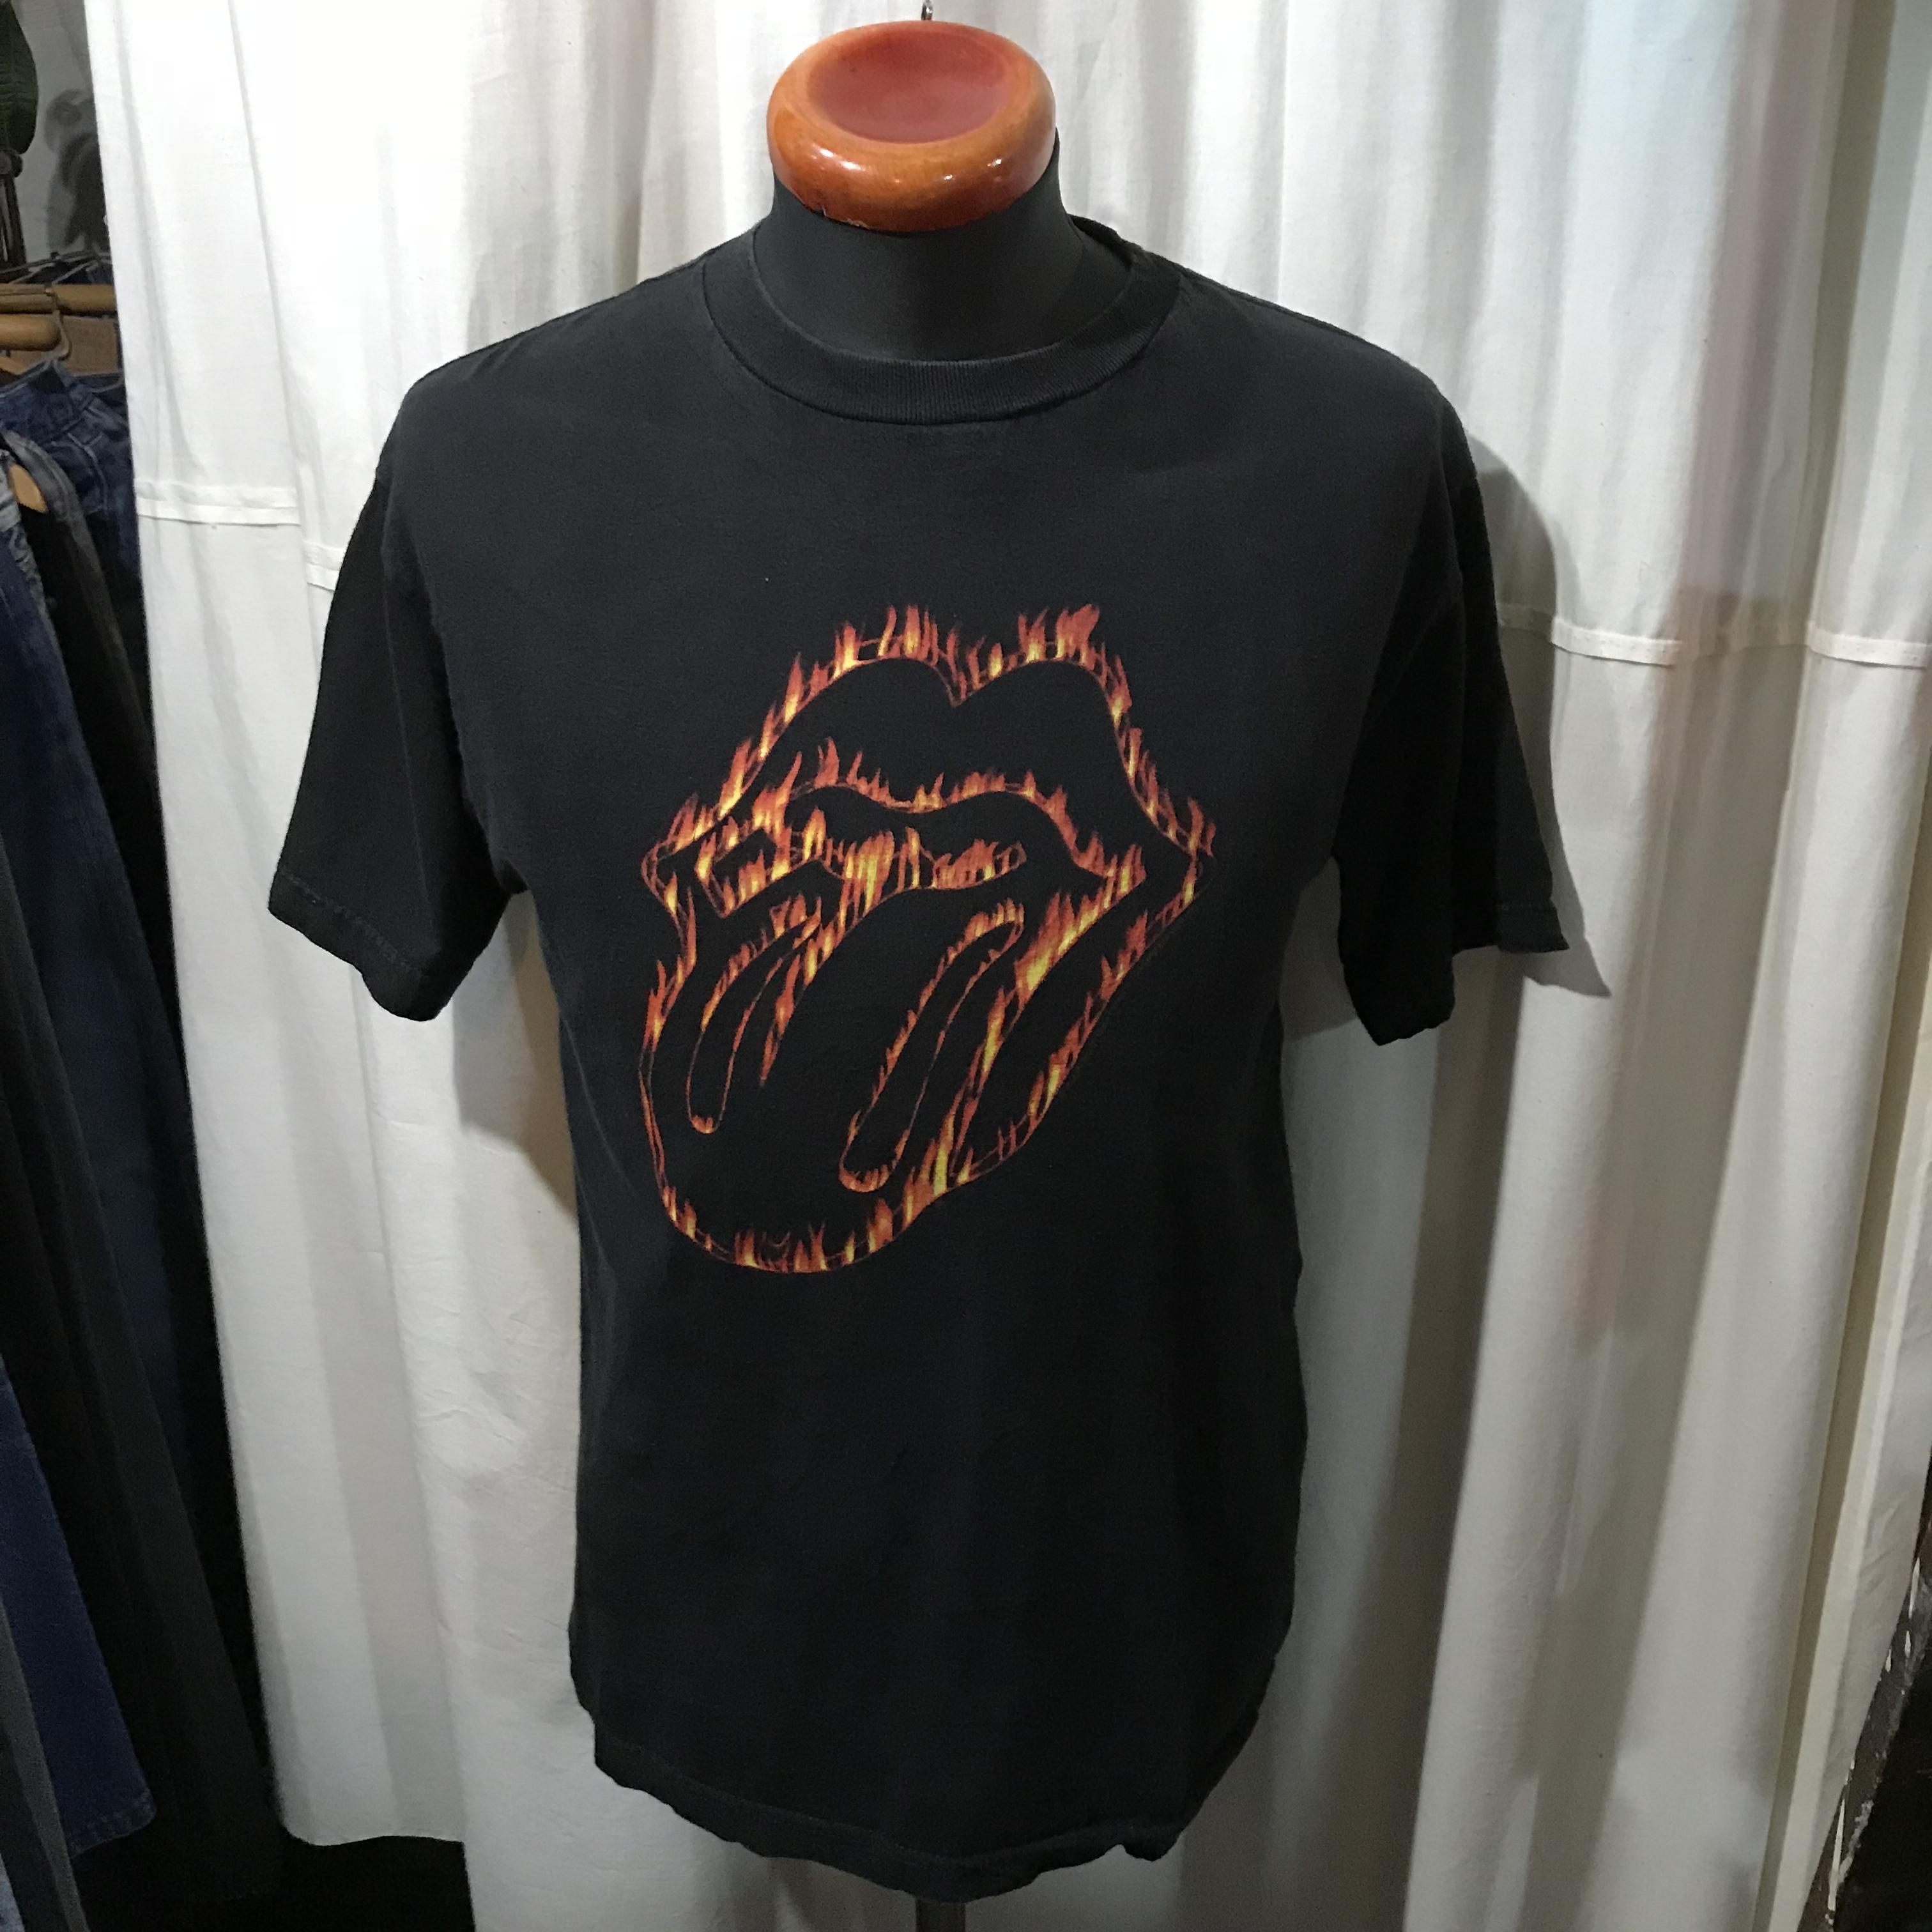 Rolling Stones ローリングストーンズ バンドTシャツ ベロ ファイアーパターン メンズM